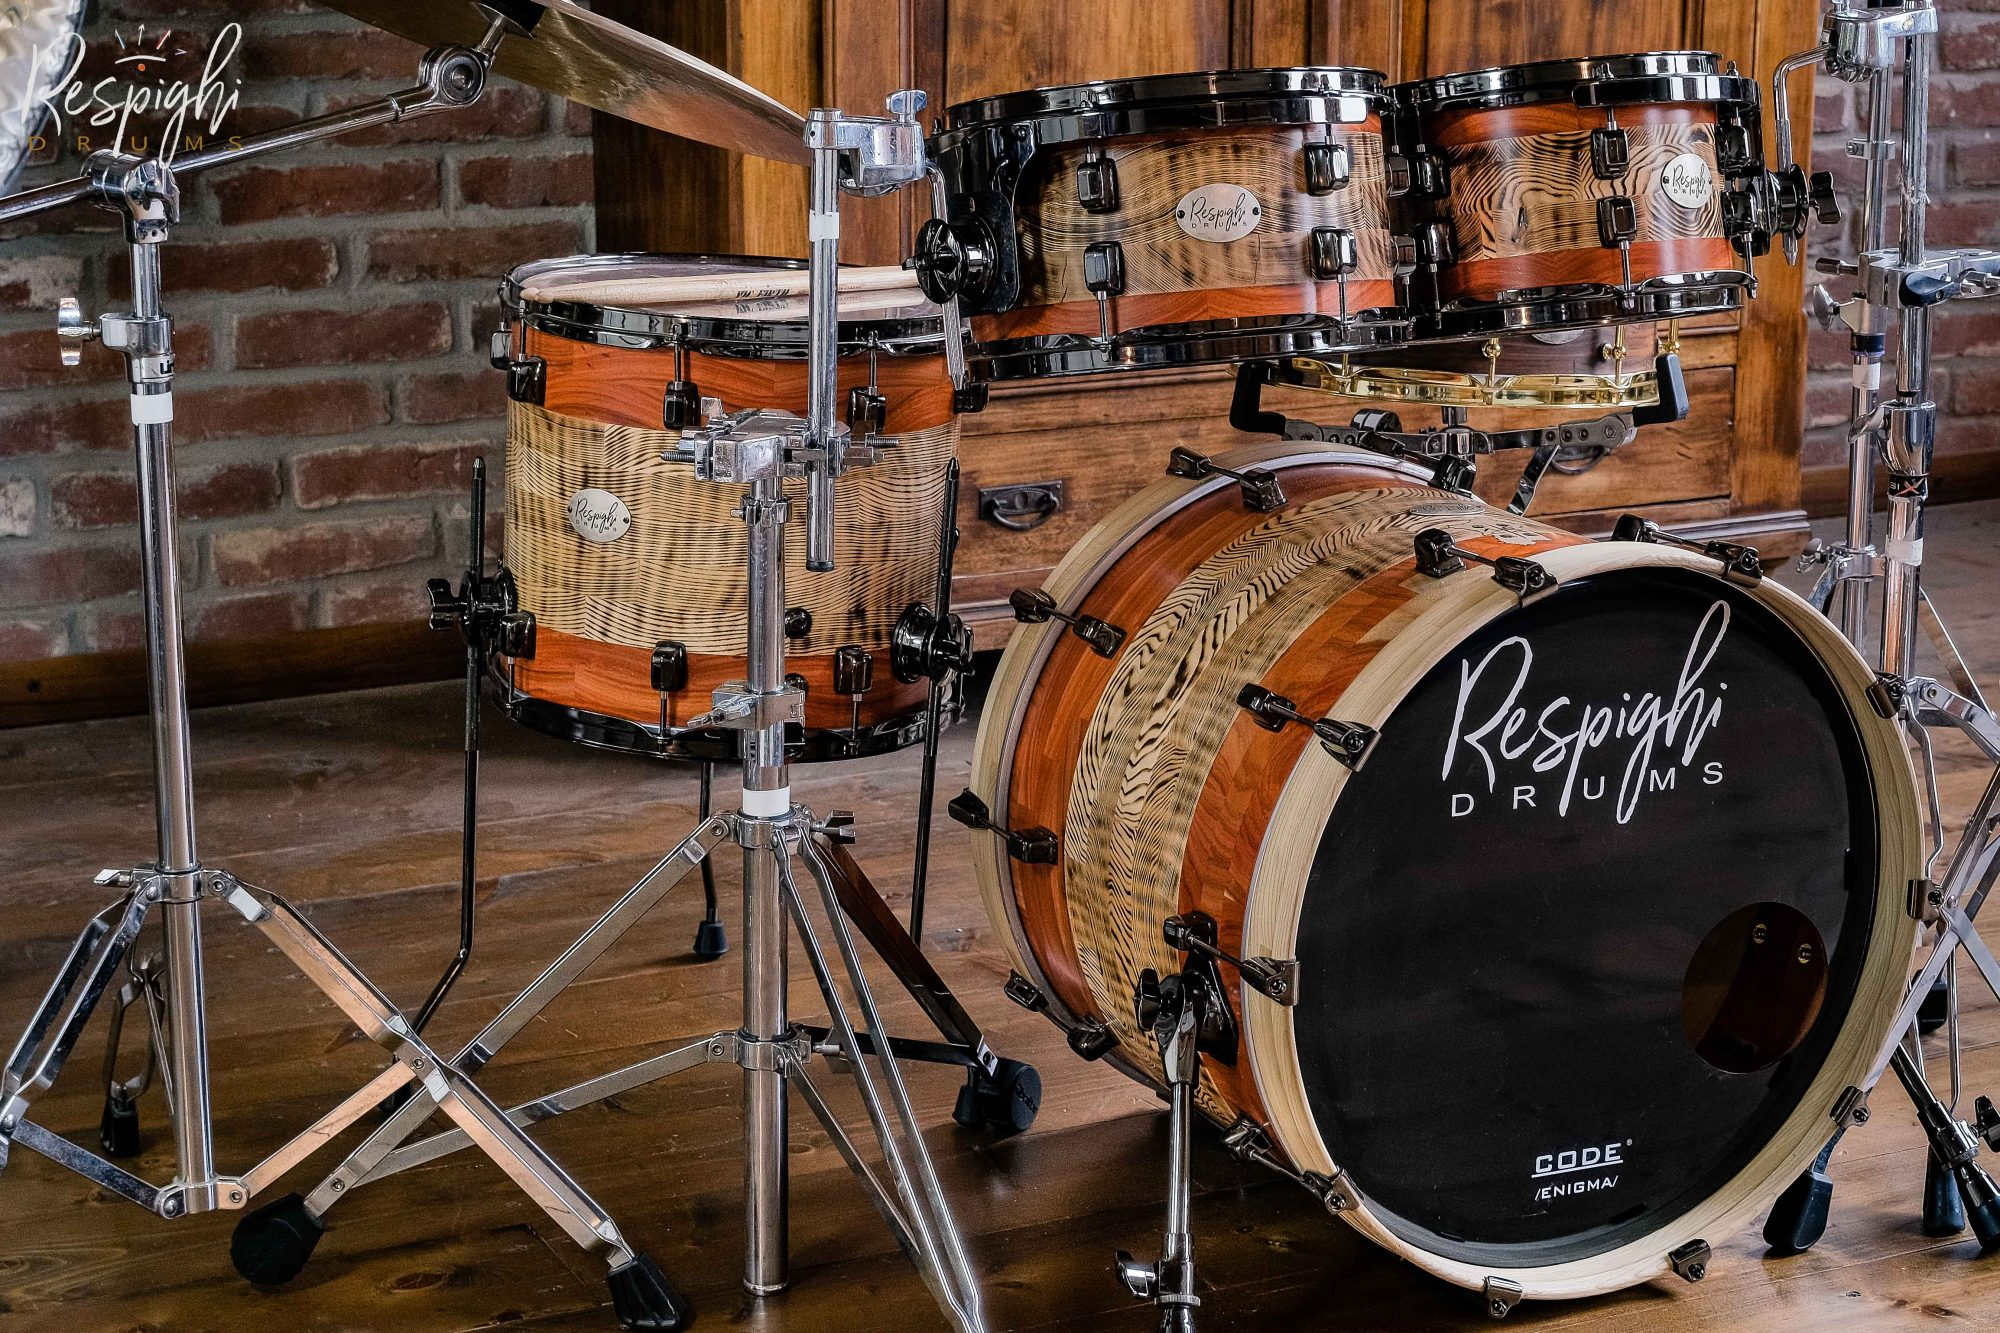 Batteria artigianale a doghe orizzontali in frassino e padouk Sardegna Mood di Respighi Drums